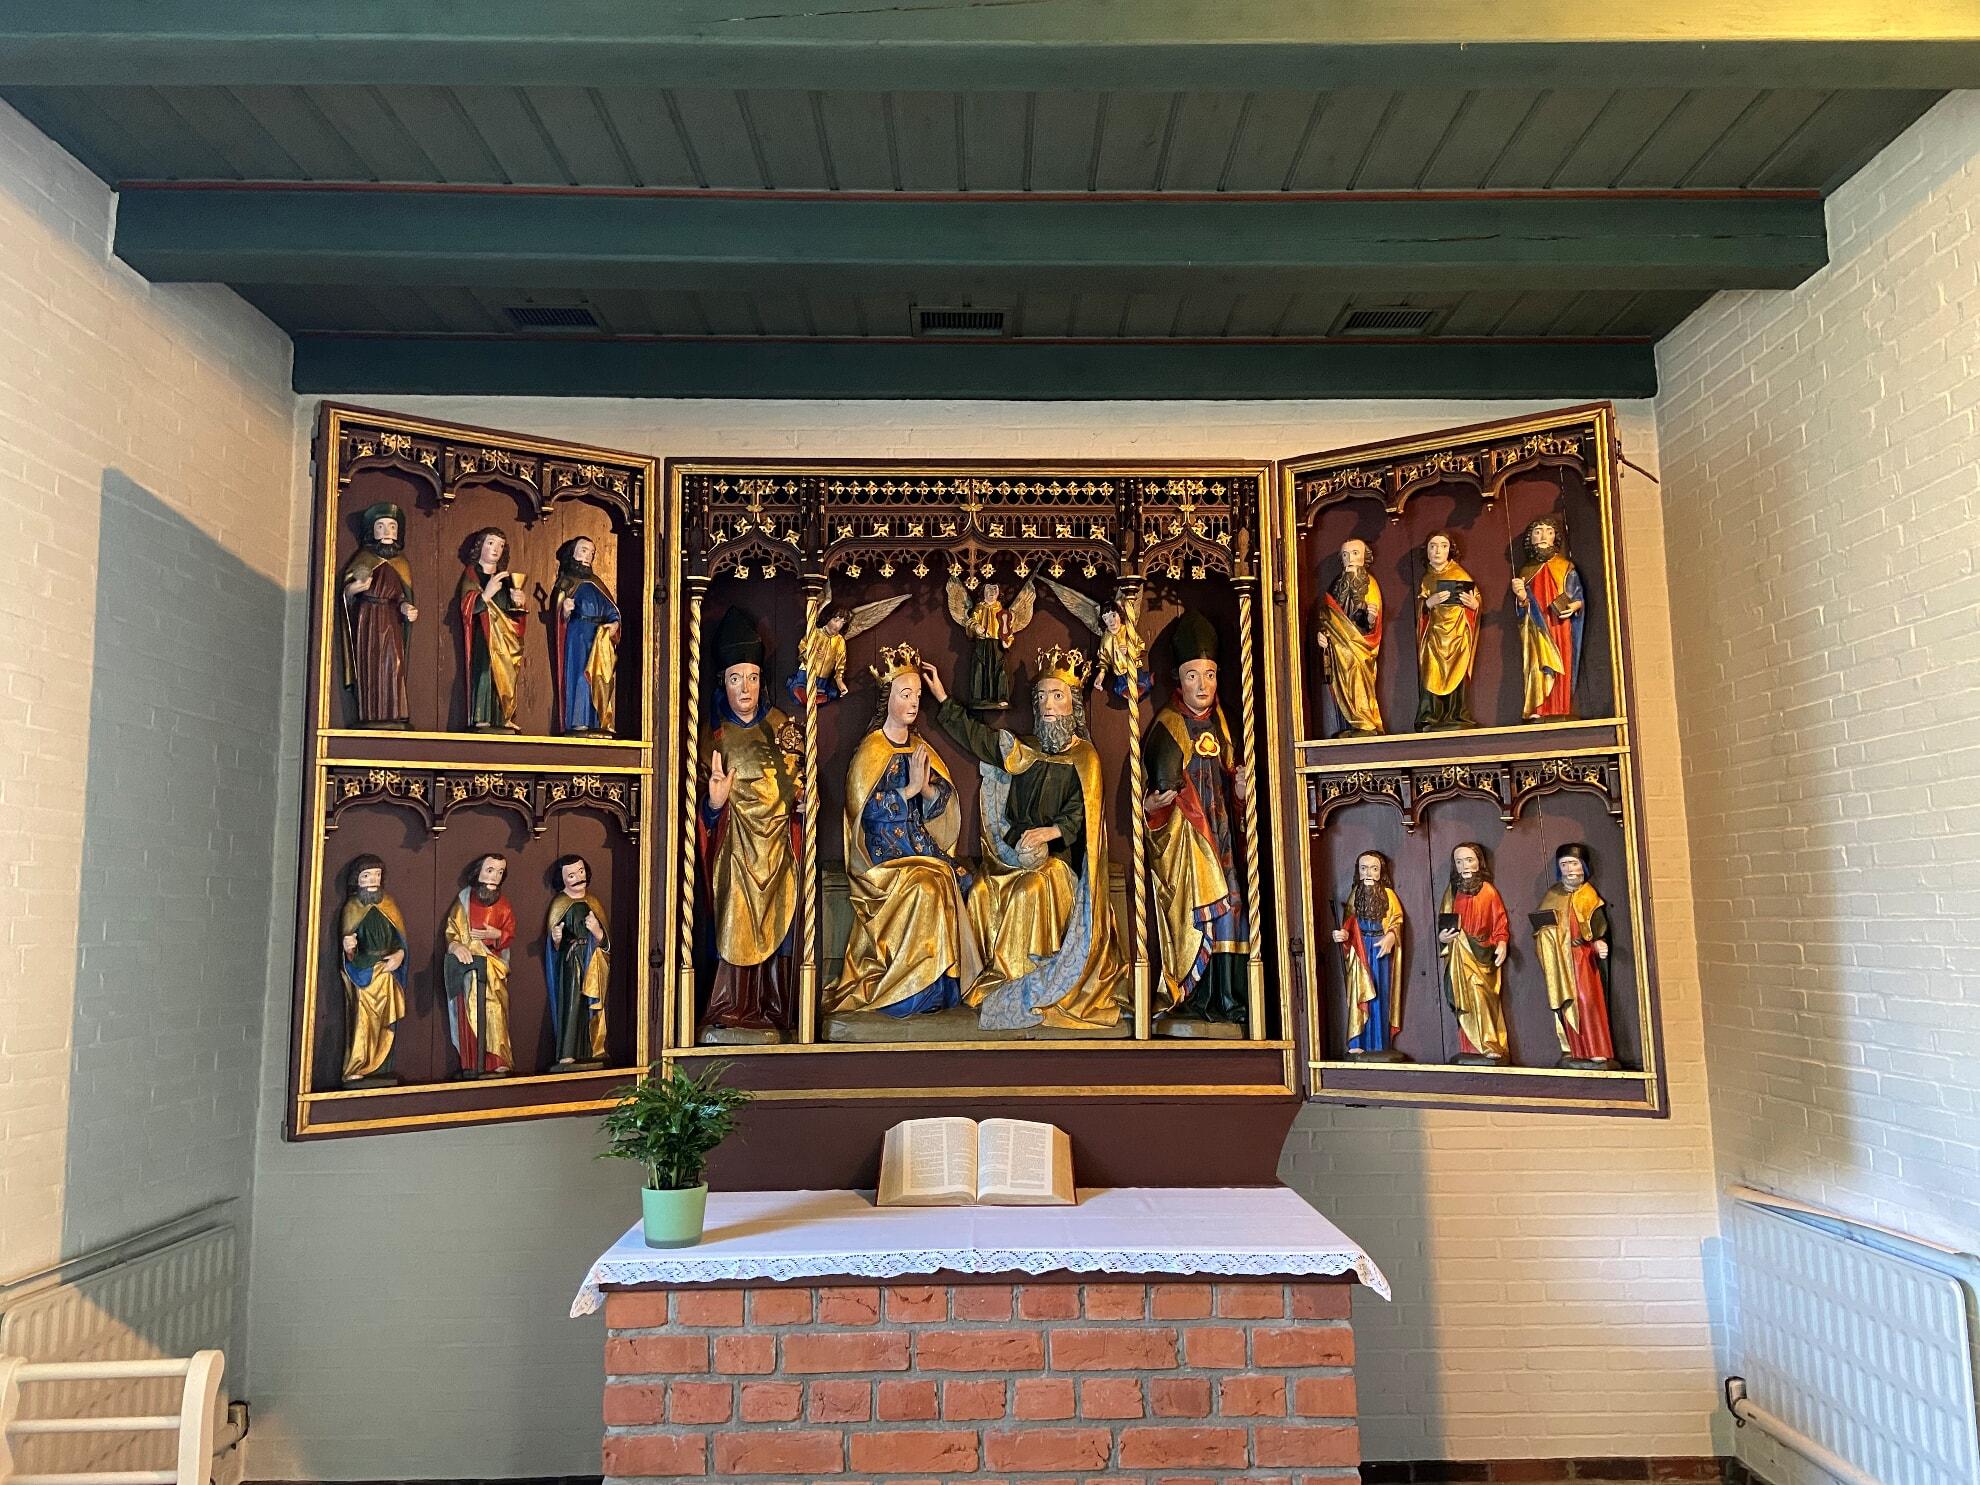 Altar in der Kirche St. Niels